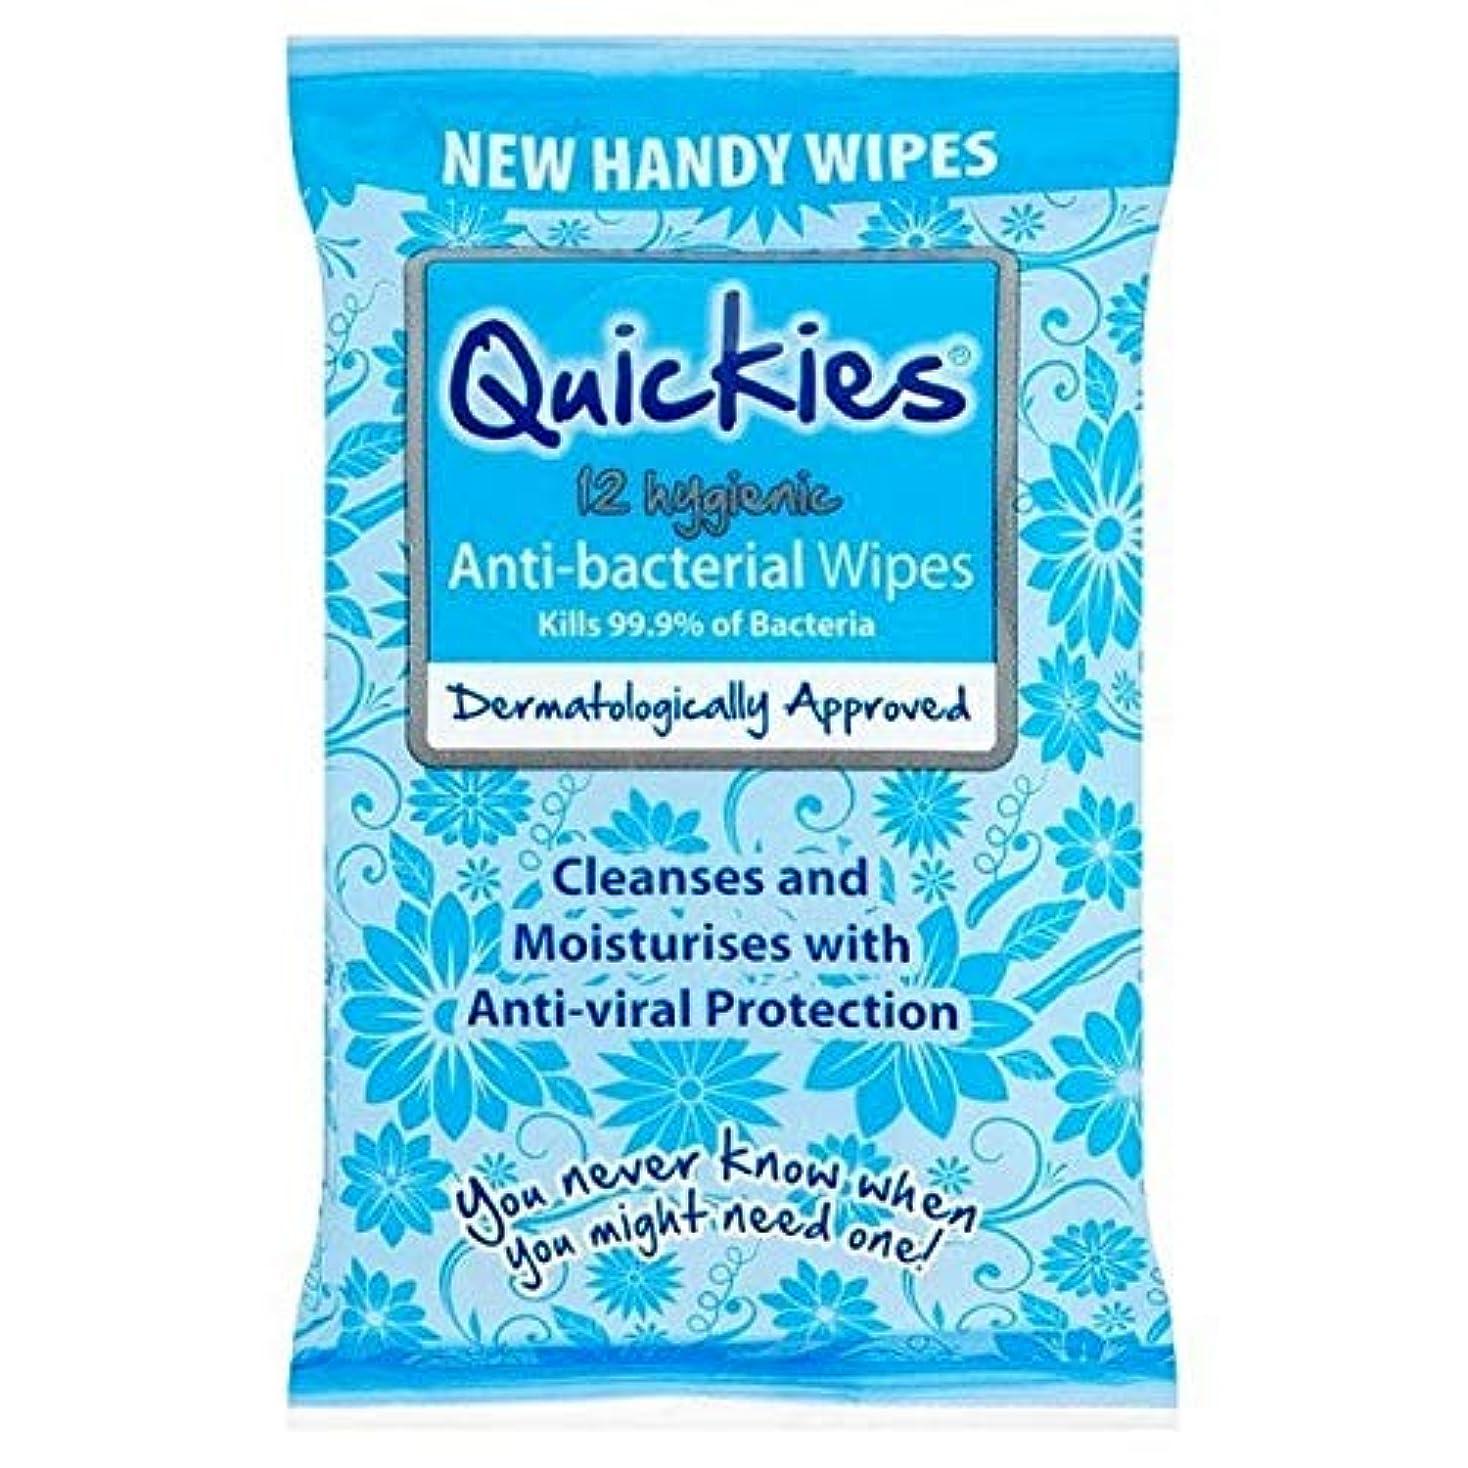 [Quickies ] 抗BacはX12をワイプ短時間セックス - Quickies Anti-Bac Wipes X12 [並行輸入品]